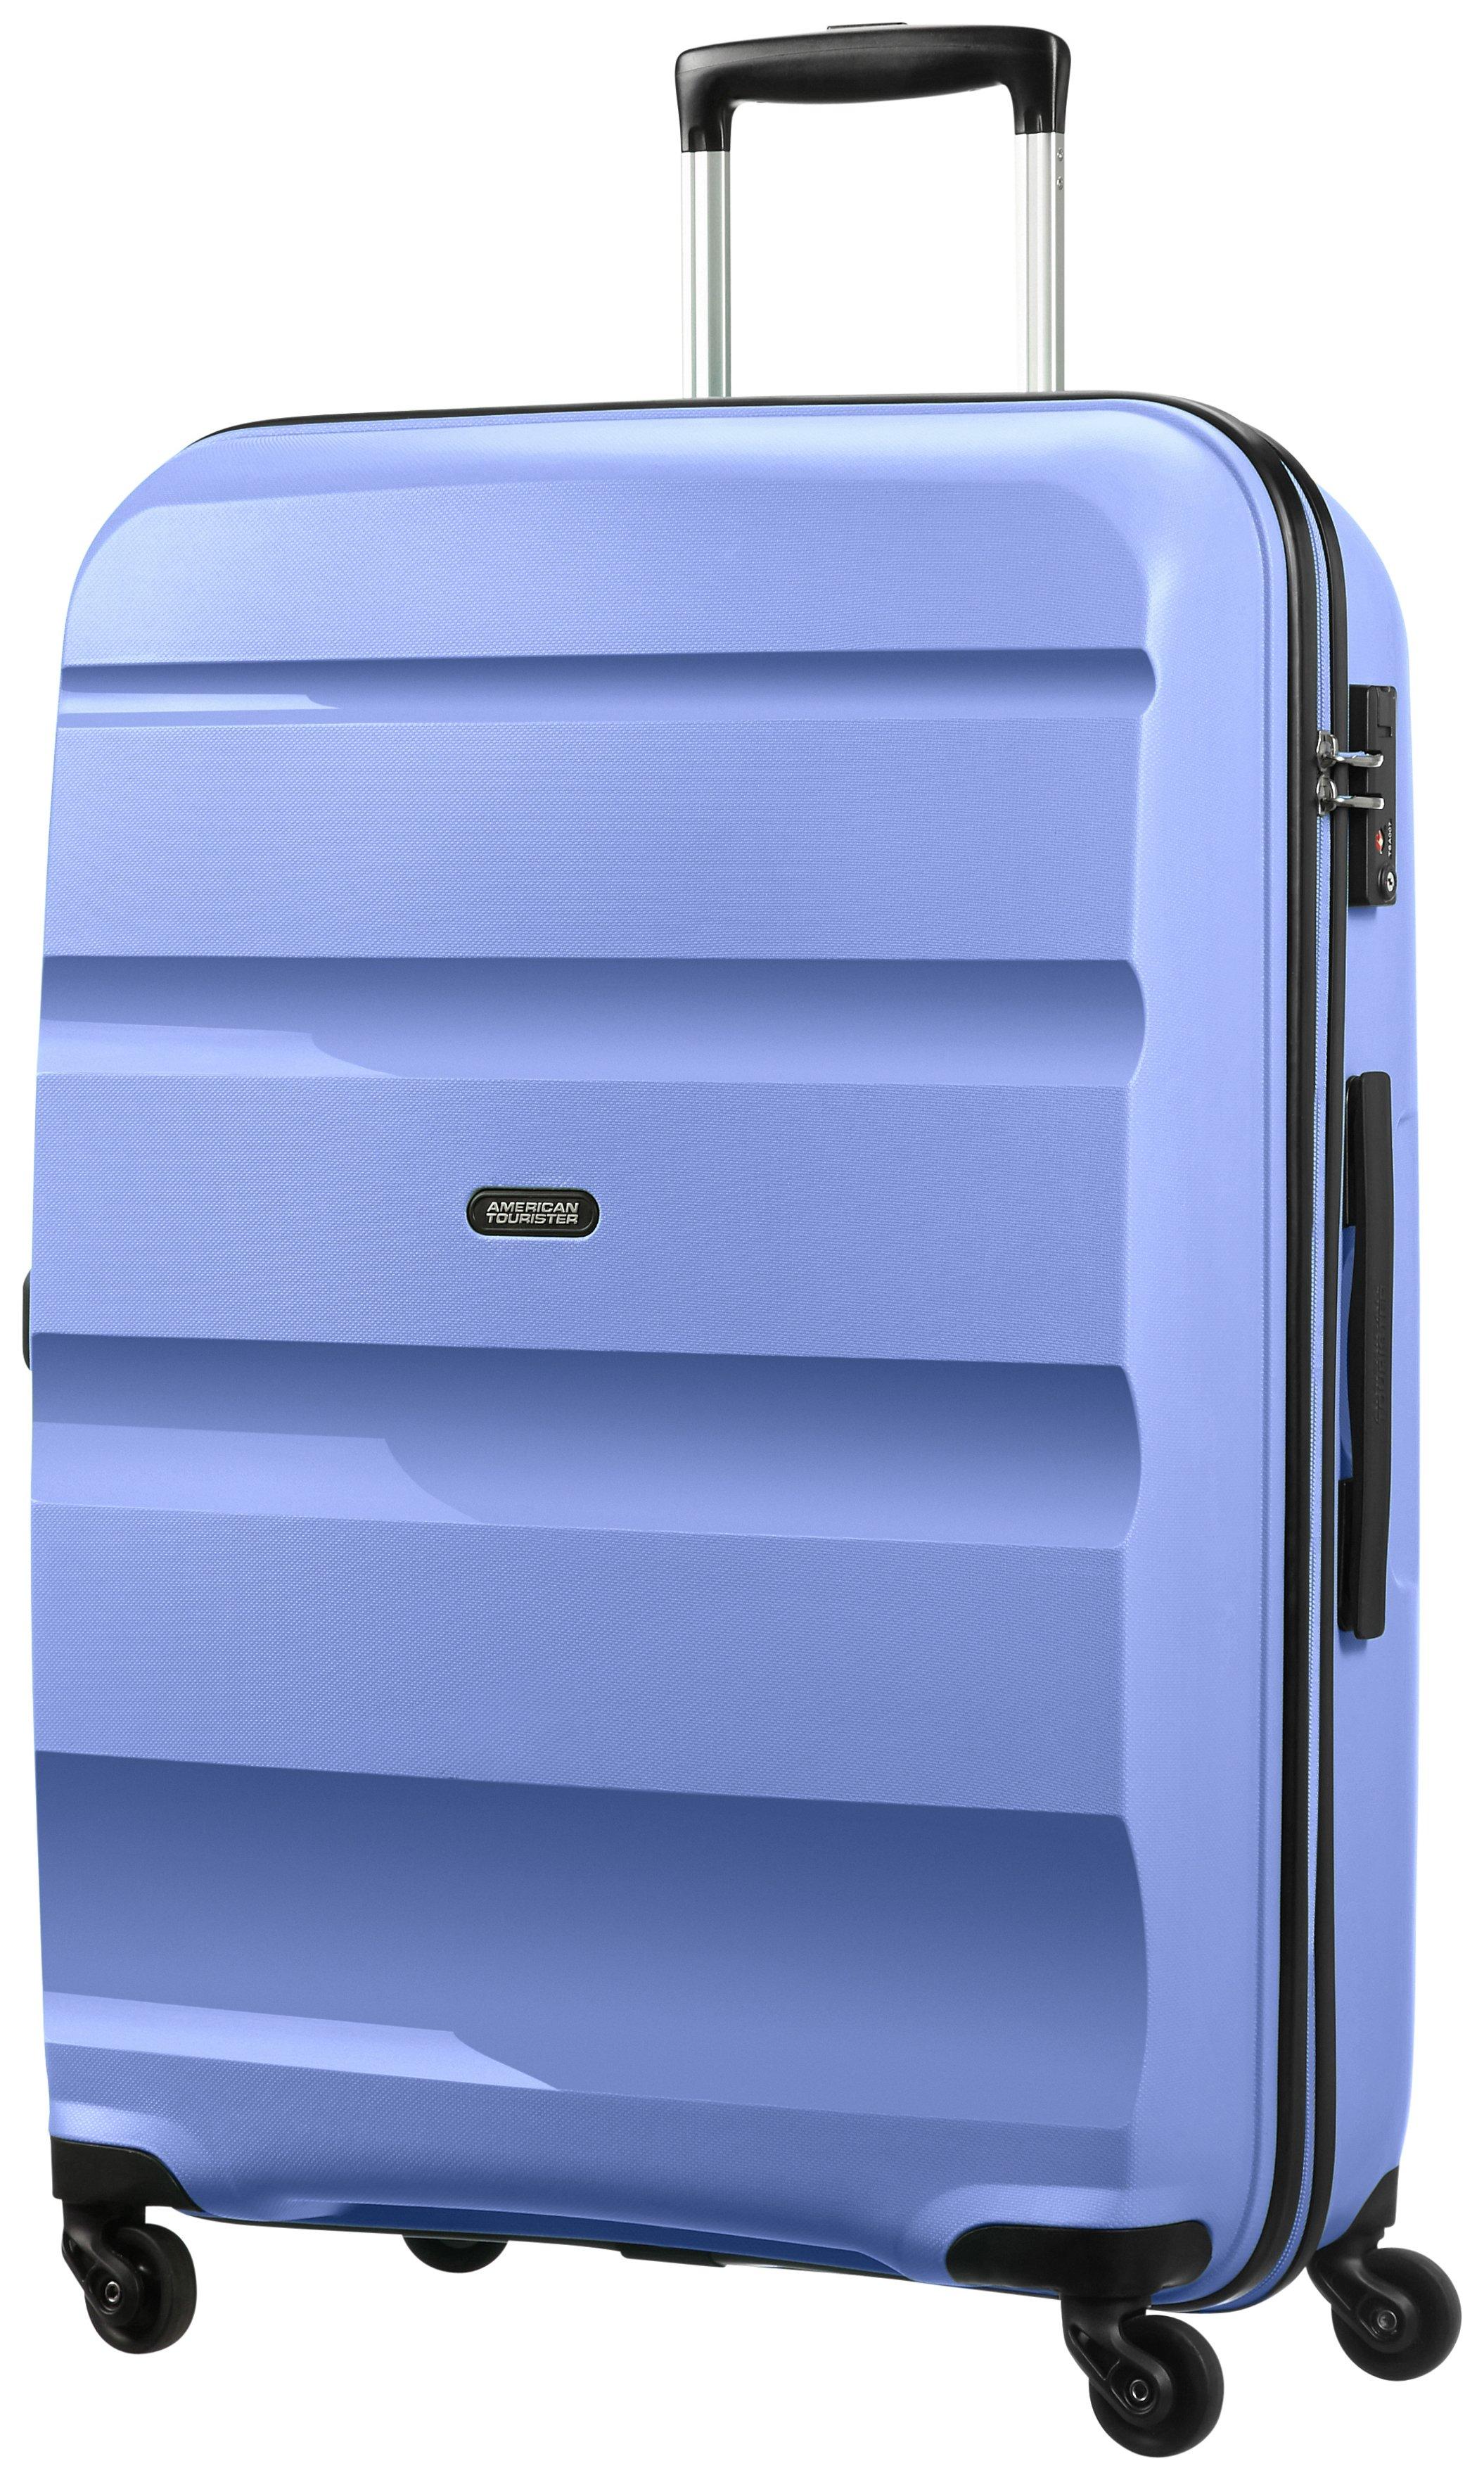 Image of American Tourister Bon Air 91 litre 4 Wheel Suitcase - Blue